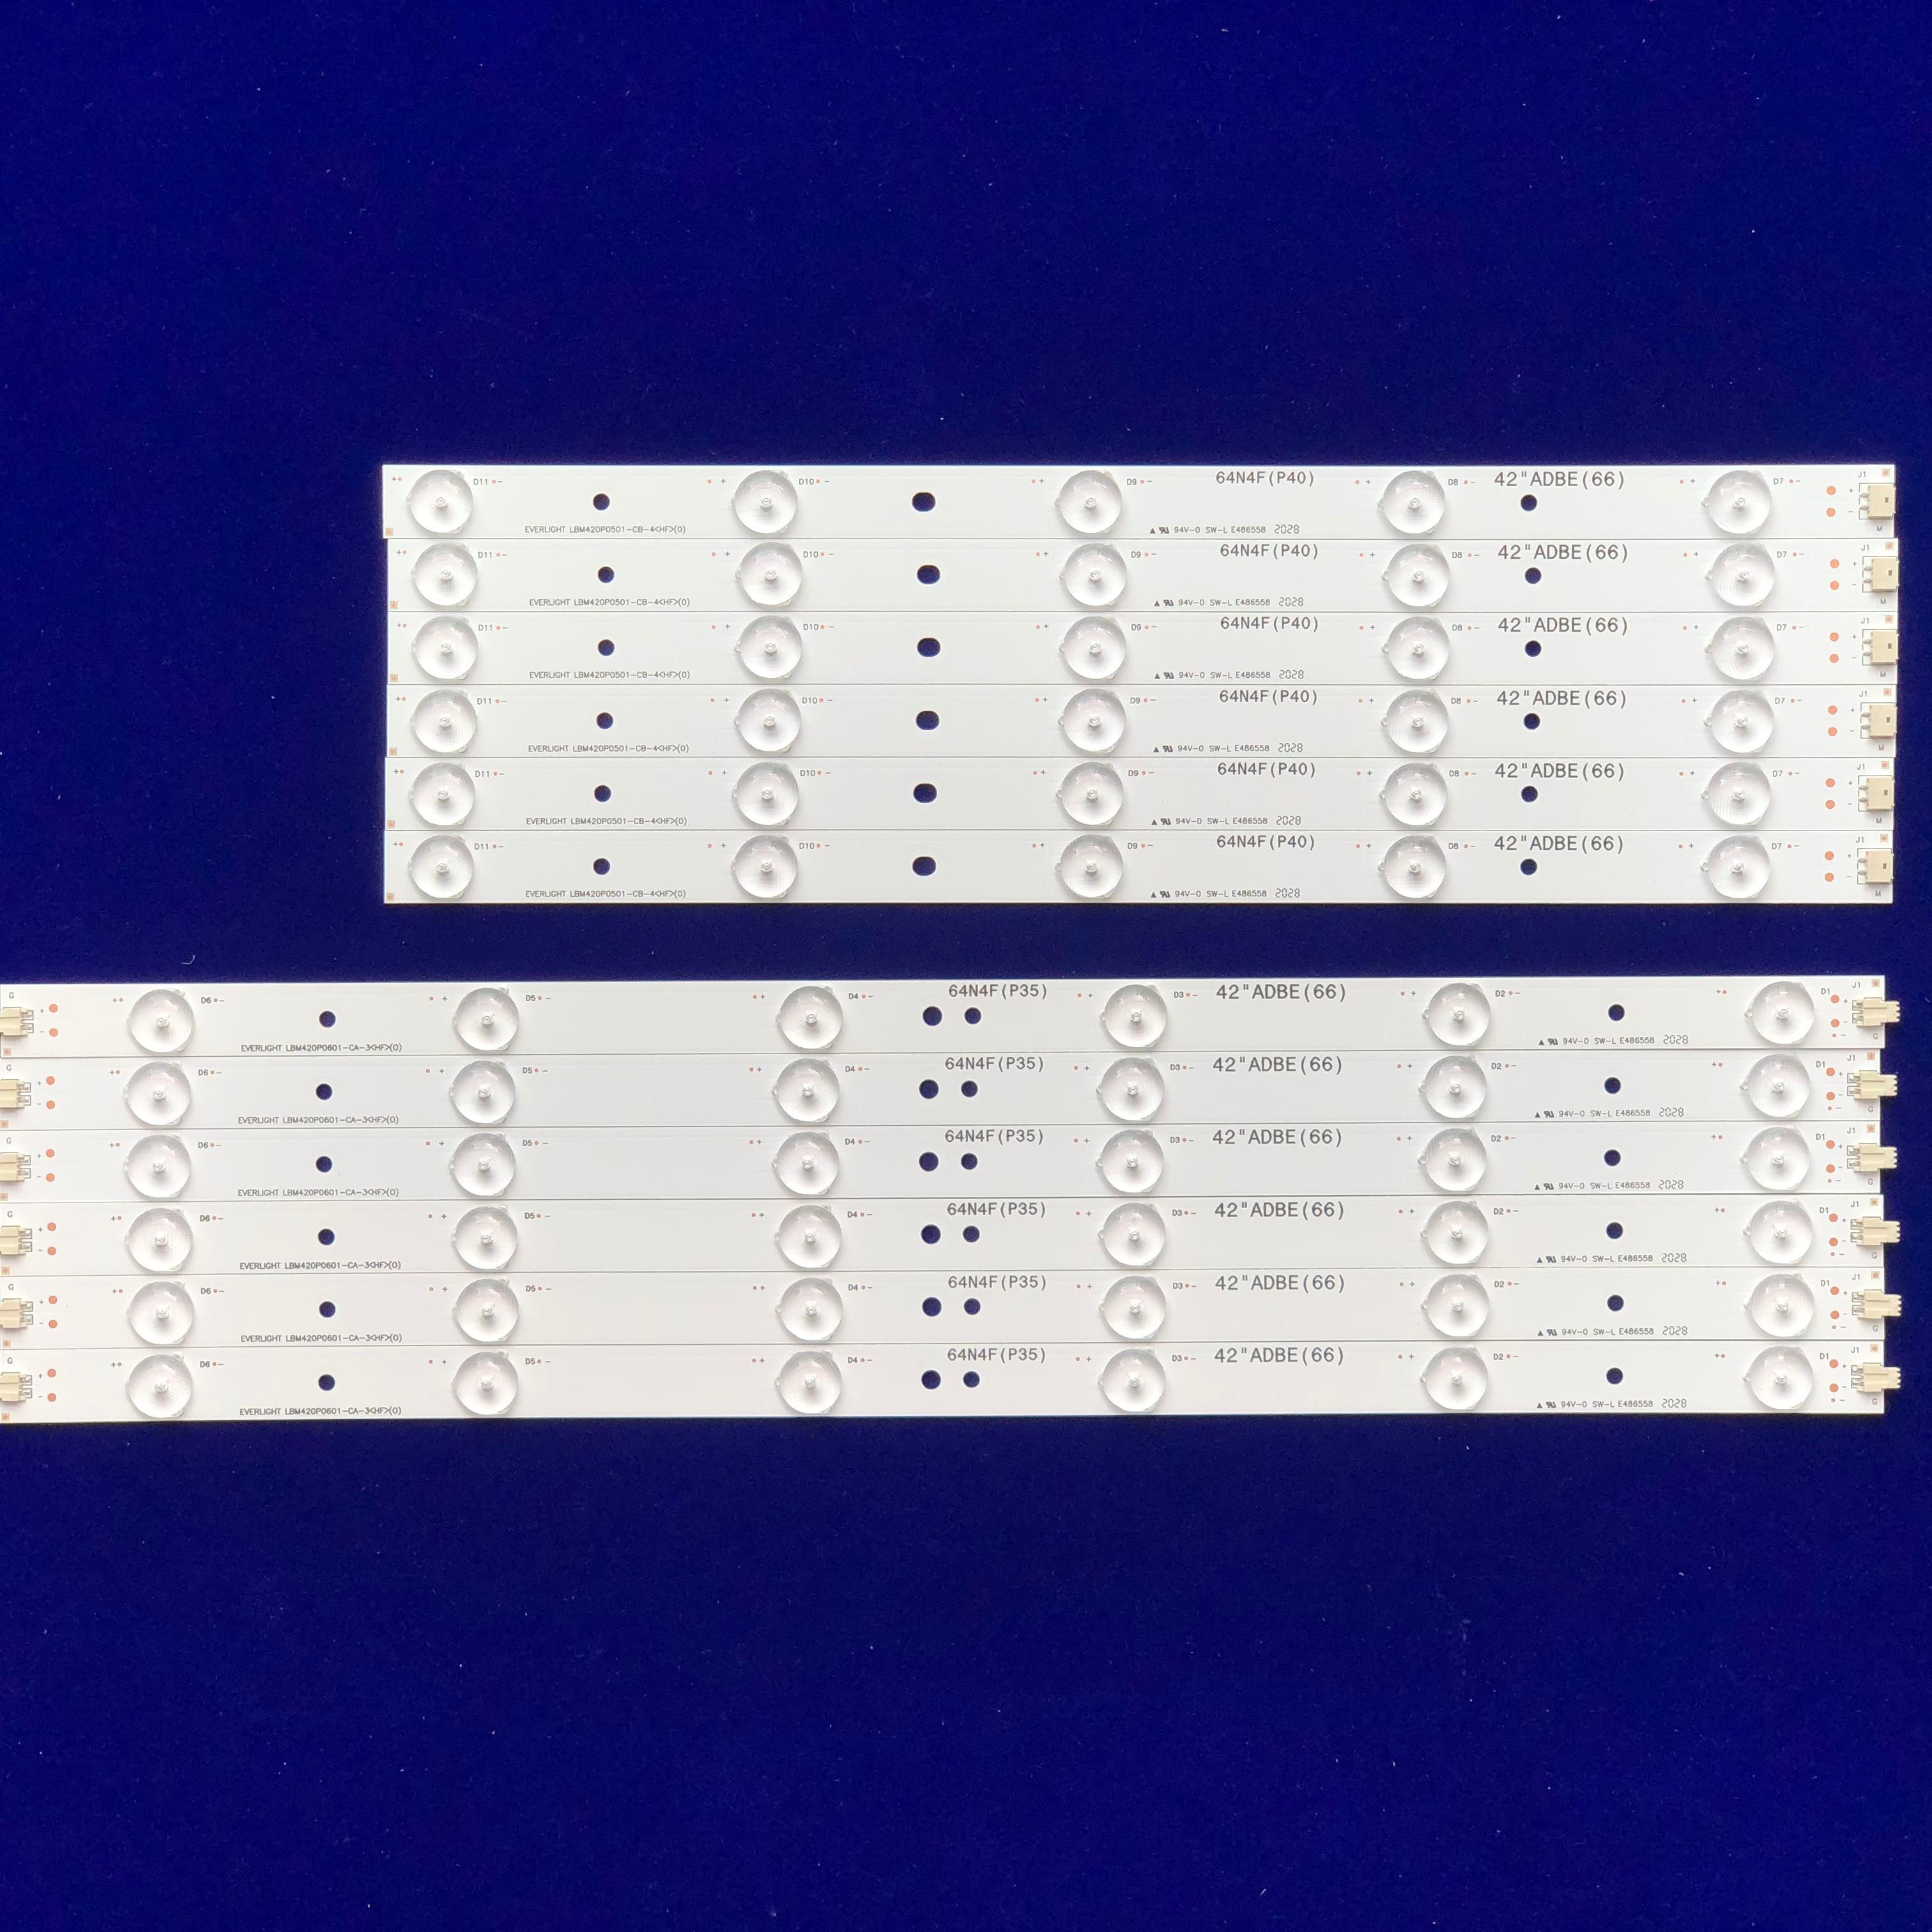 LED شريط إضاءة خلفي ل 42PFL3208H/12 42PFL3008D/78 42PFL3108K/12 42PFL3188H/12 42PFL3018T/6042PFL3018T/60 42PFL3208T/60